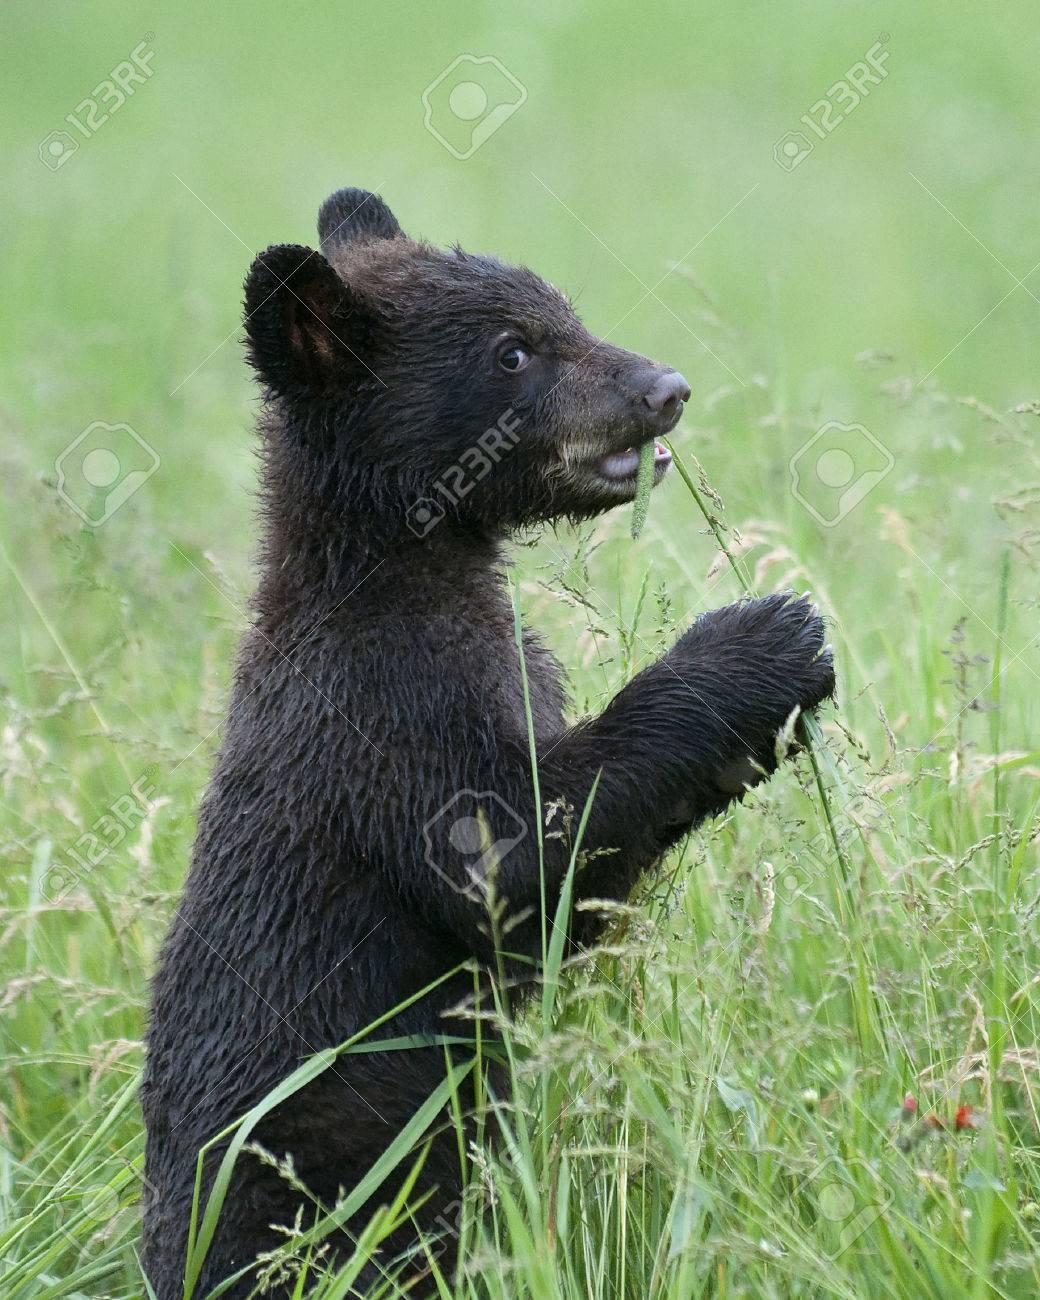 7bda937a46d Black bear cub eats spring grass with a humorous look Stock Photo - 29908392